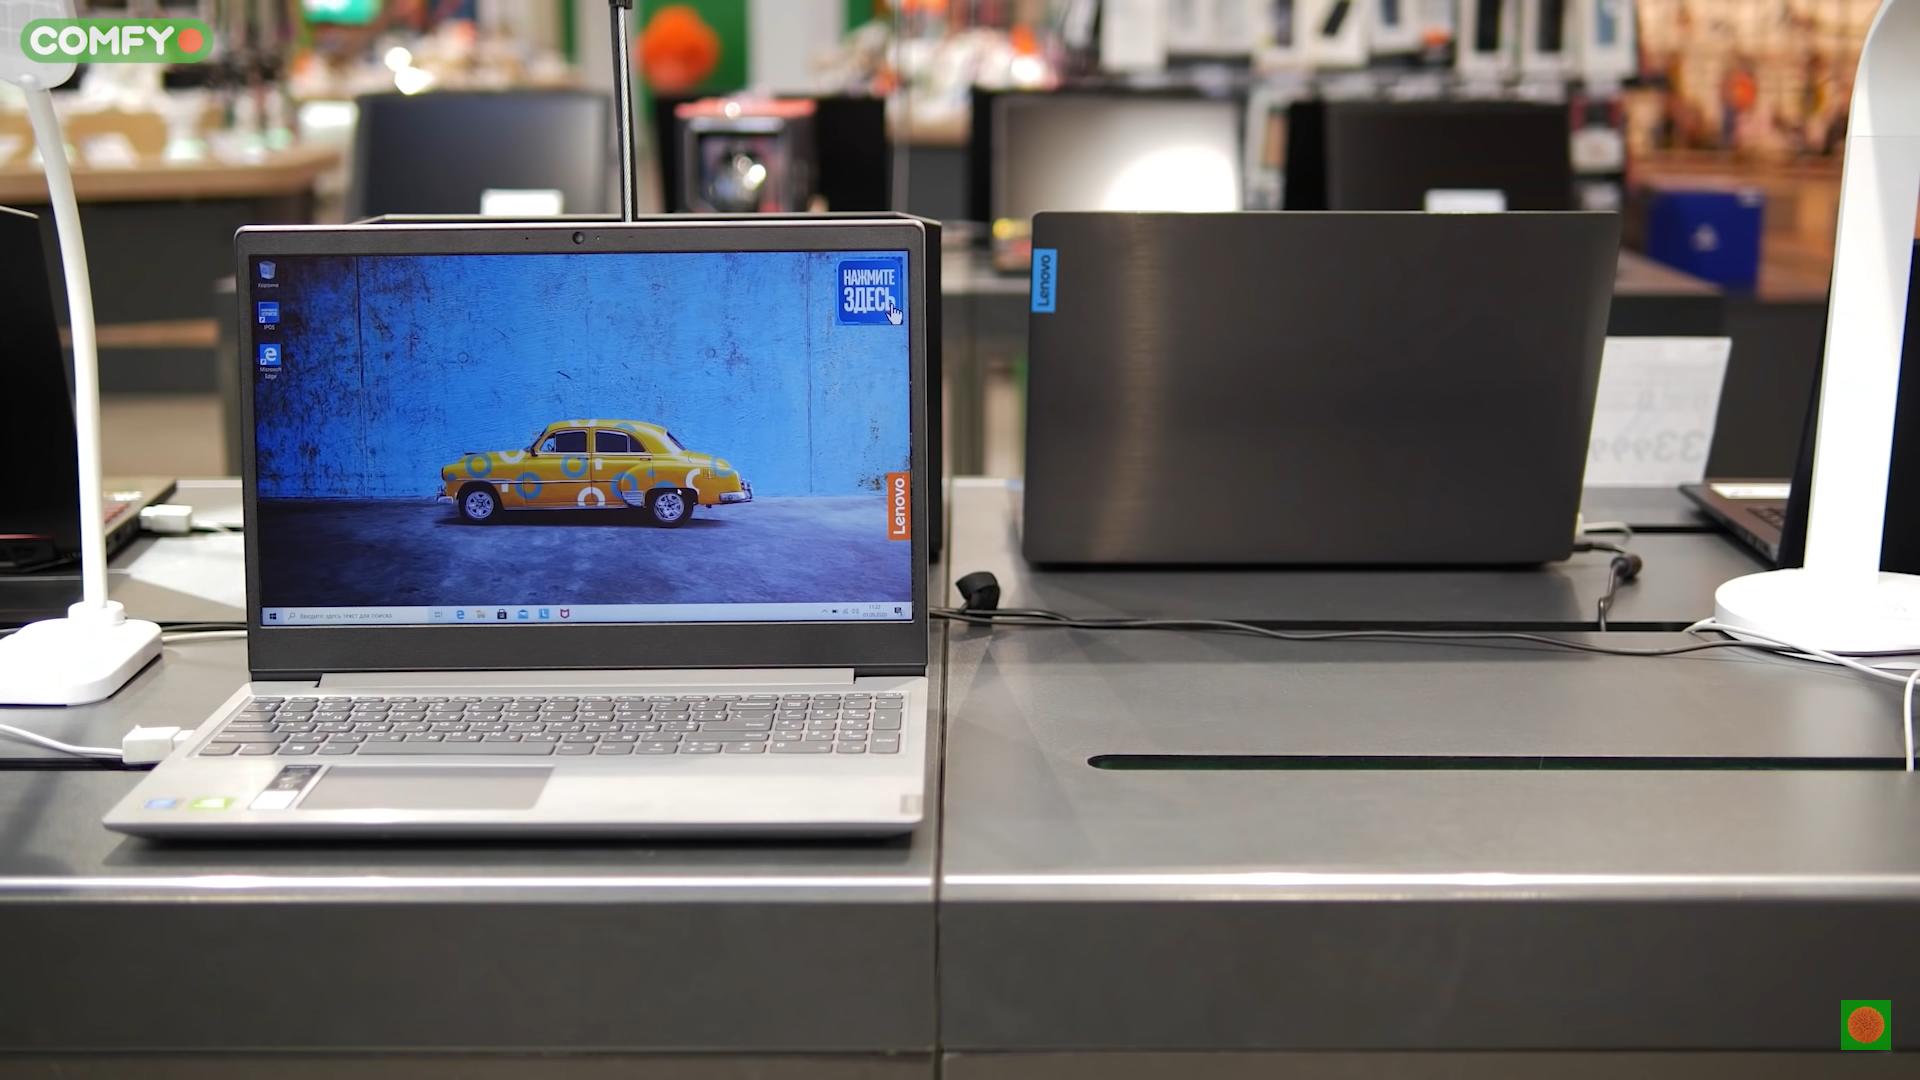 Ноутбук Lenovo c заставкой